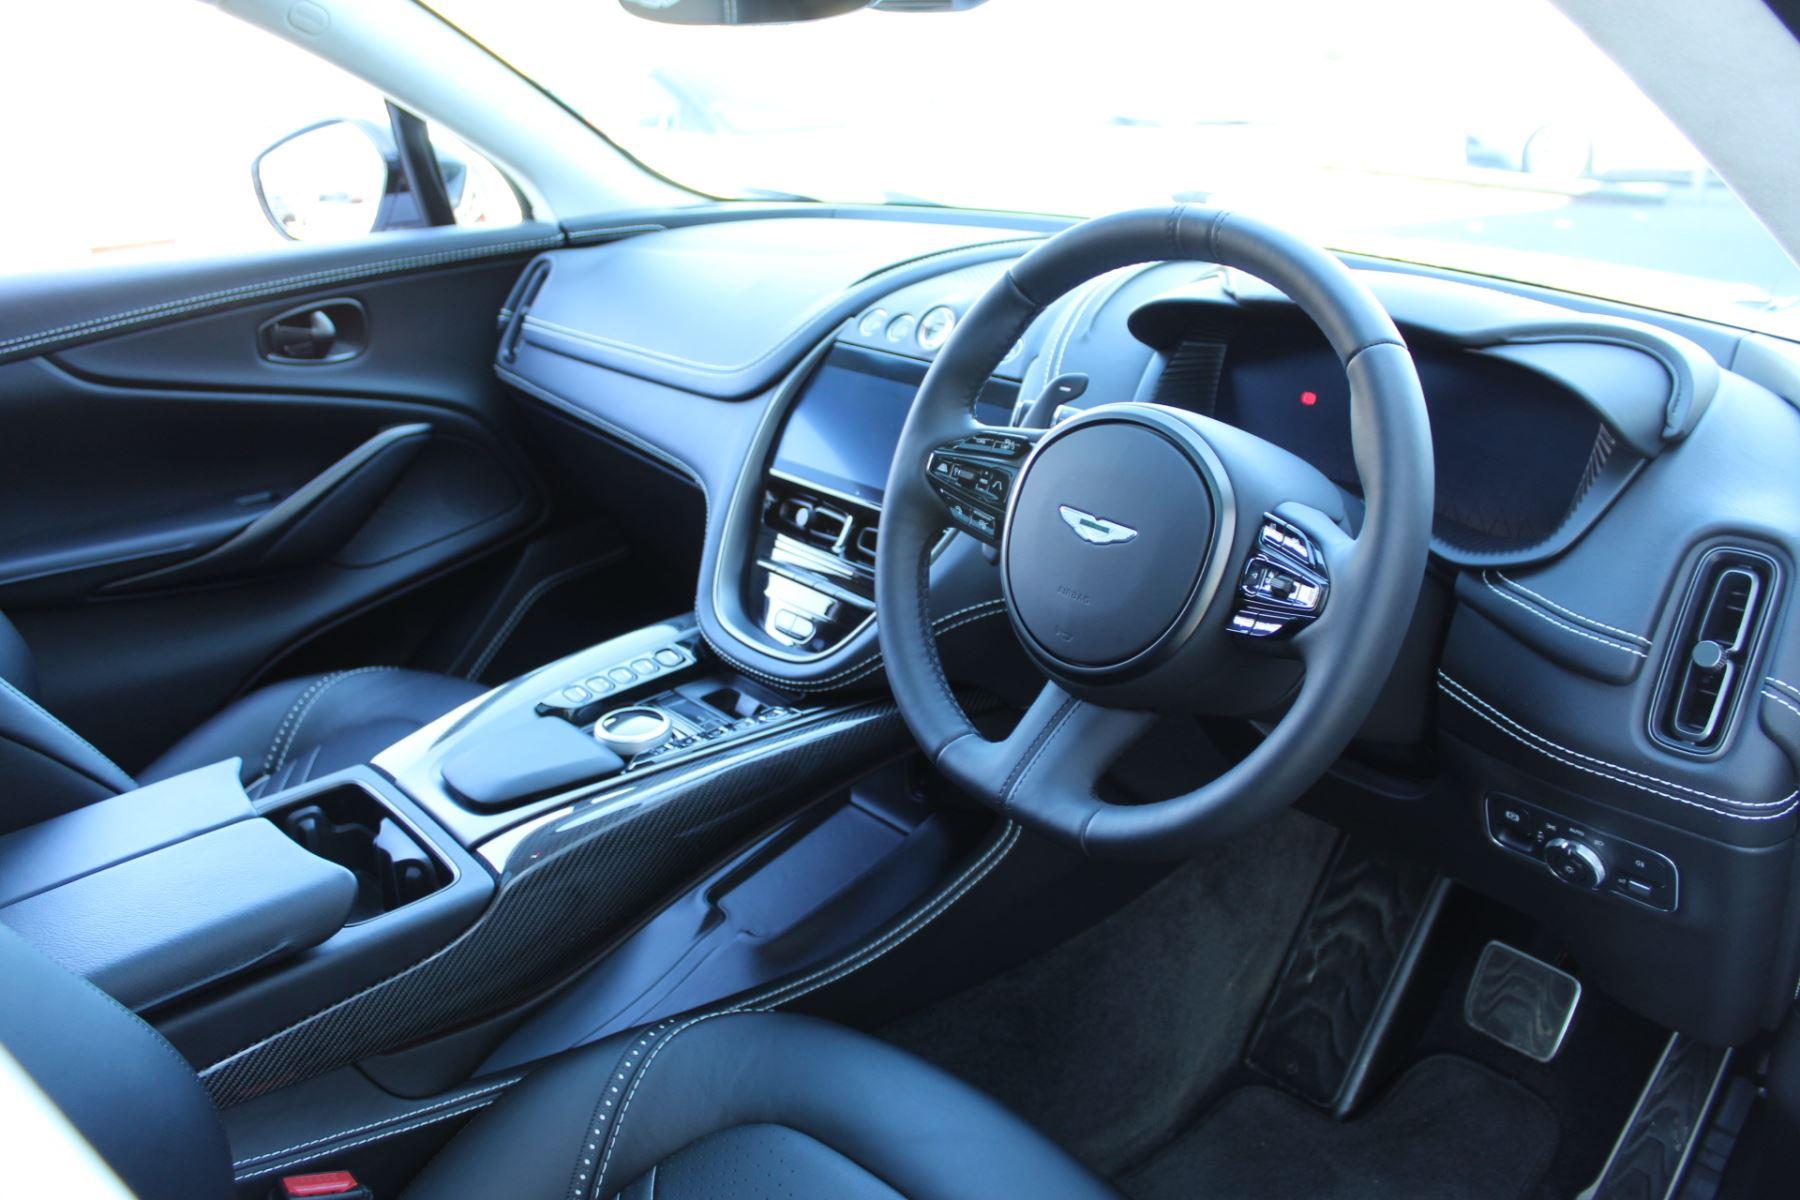 Aston Martin DBX V8 Twin Turbo Massive Spec Low mileage image 15